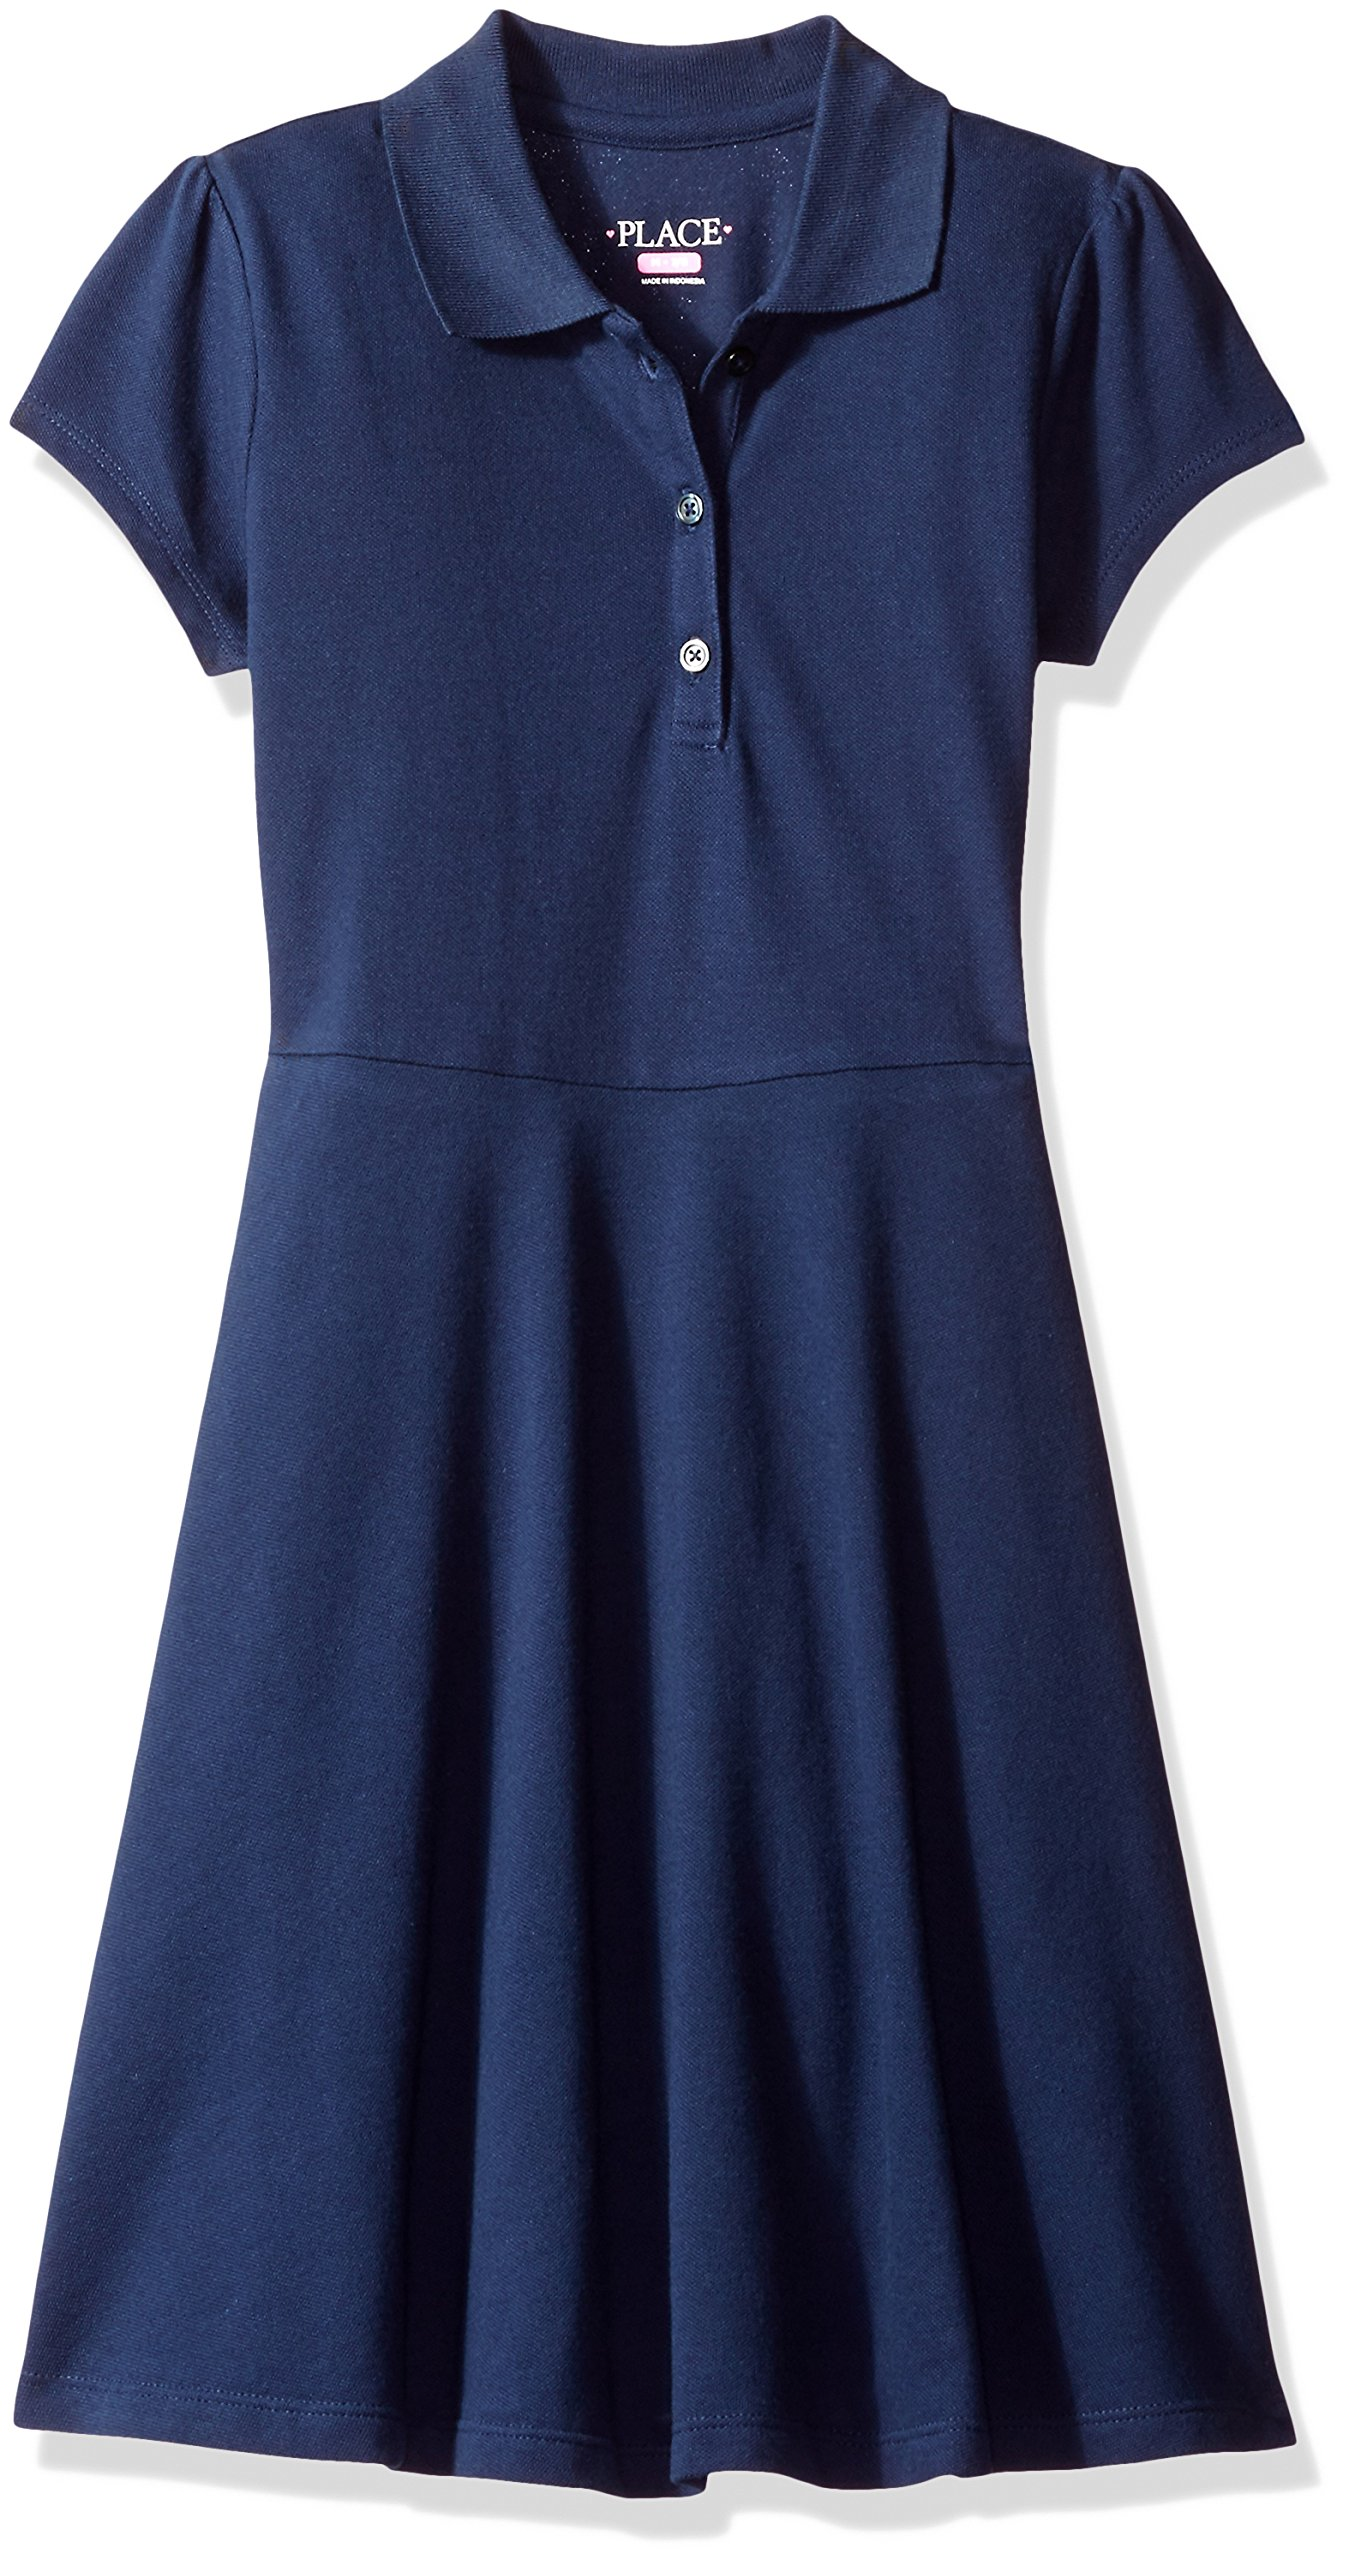 The Children's Place Big Girls' Uniform Short